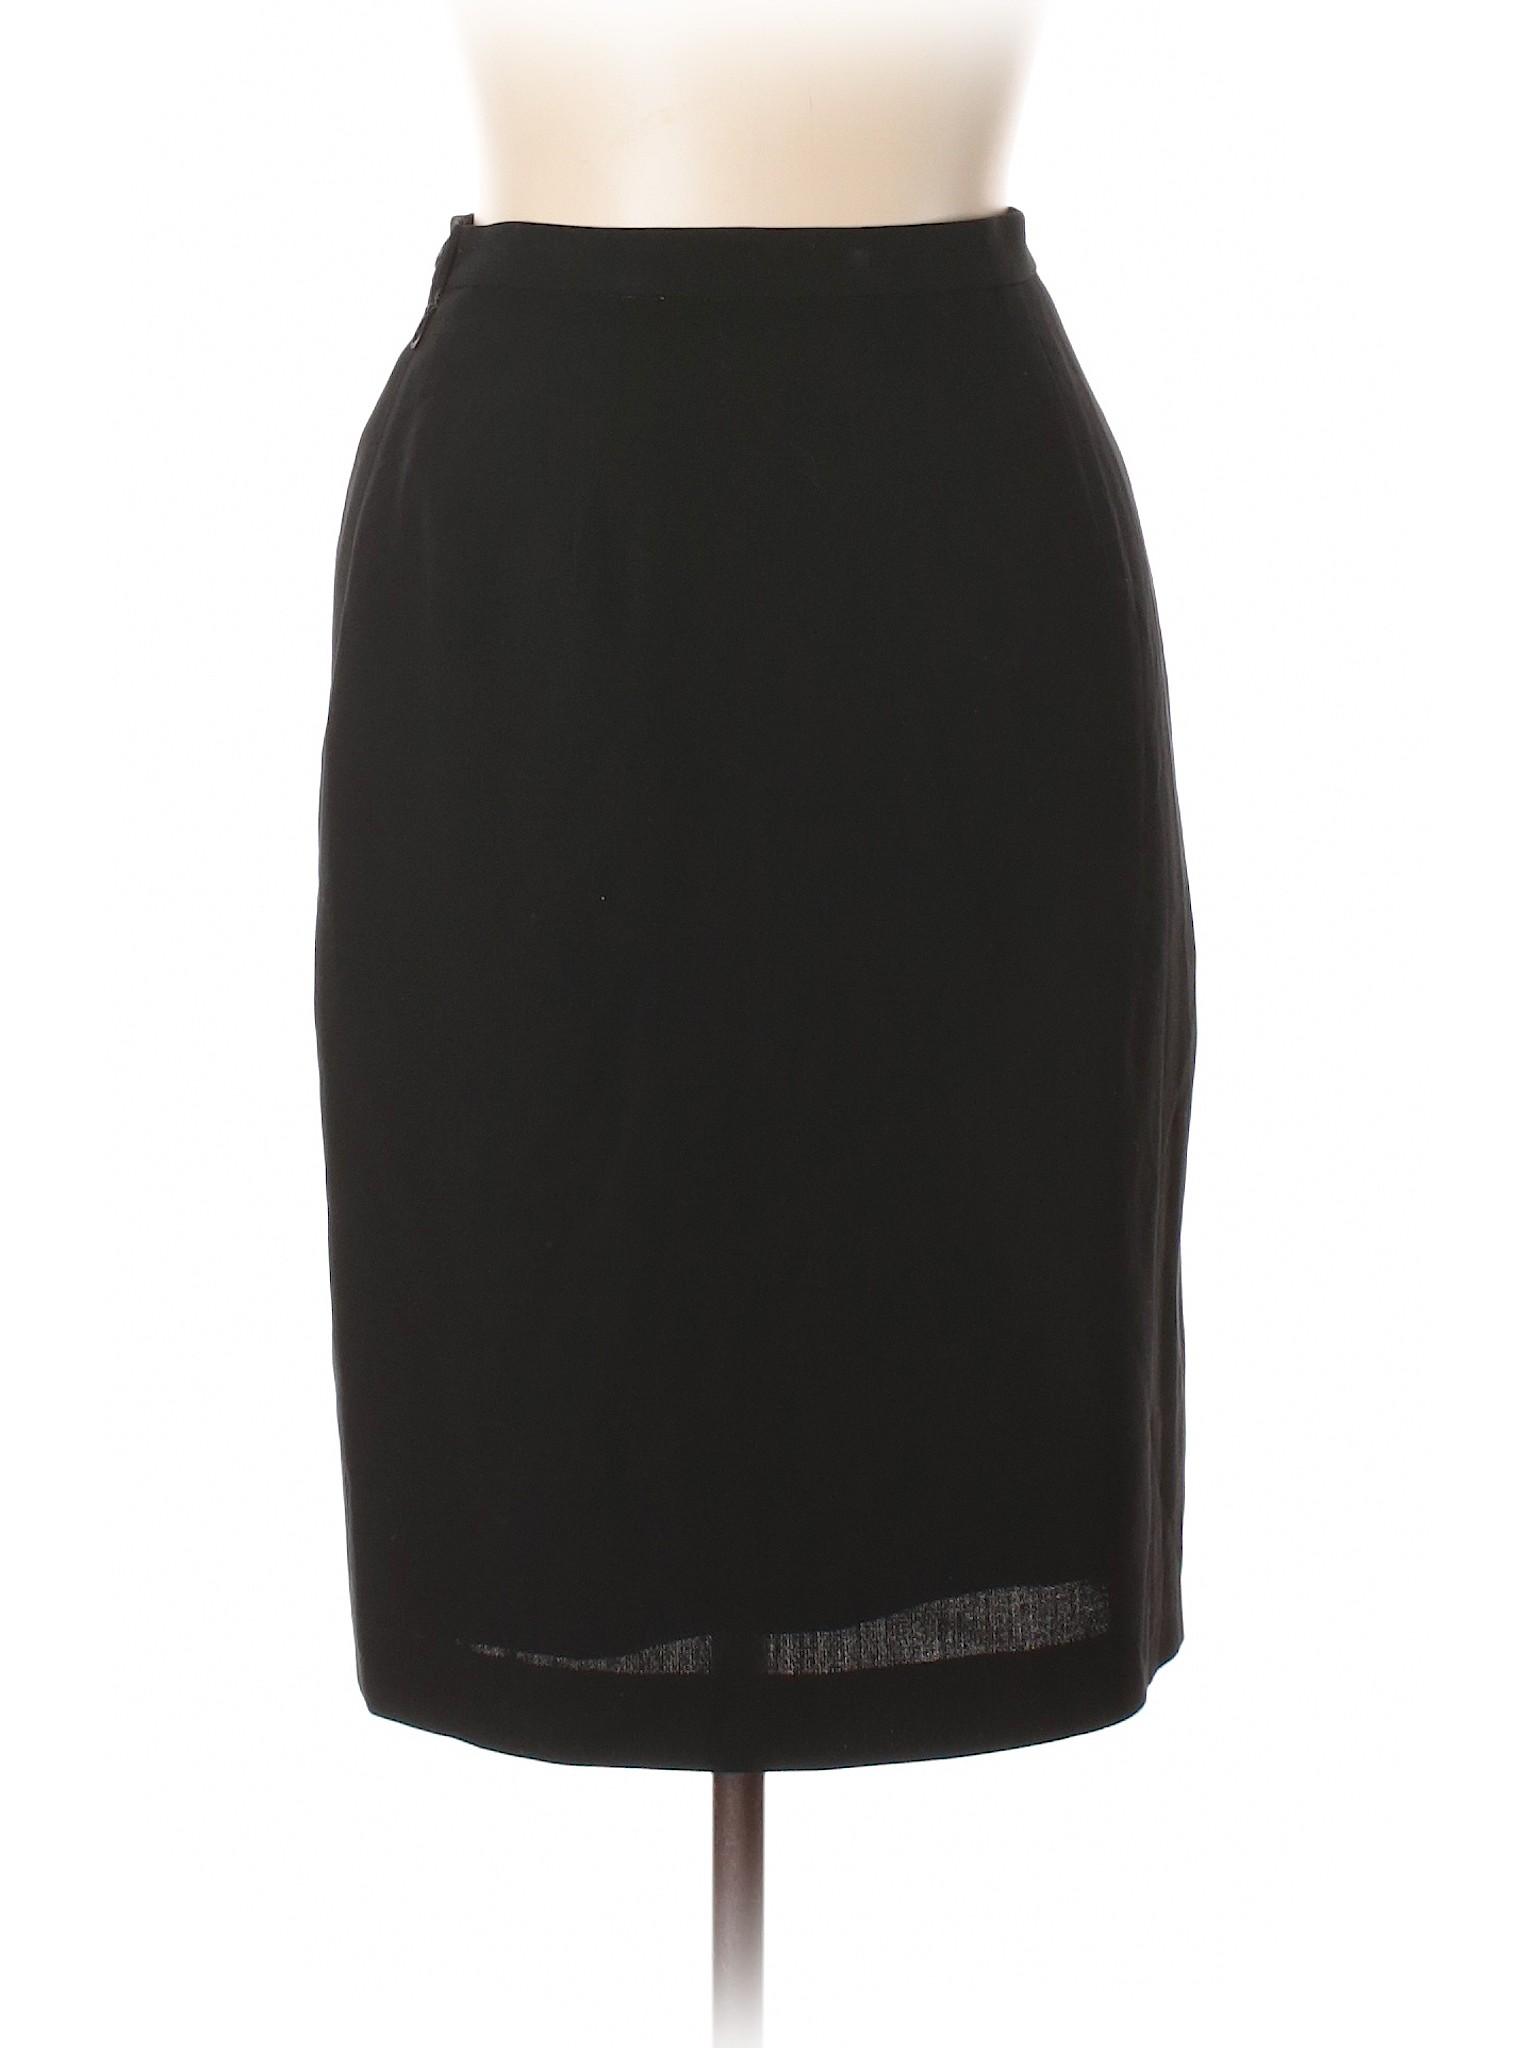 Casual Skirt Casual Skirt Casual Boutique Boutique Boutique Skirt Casual Skirt Boutique w0Hq7SWHa